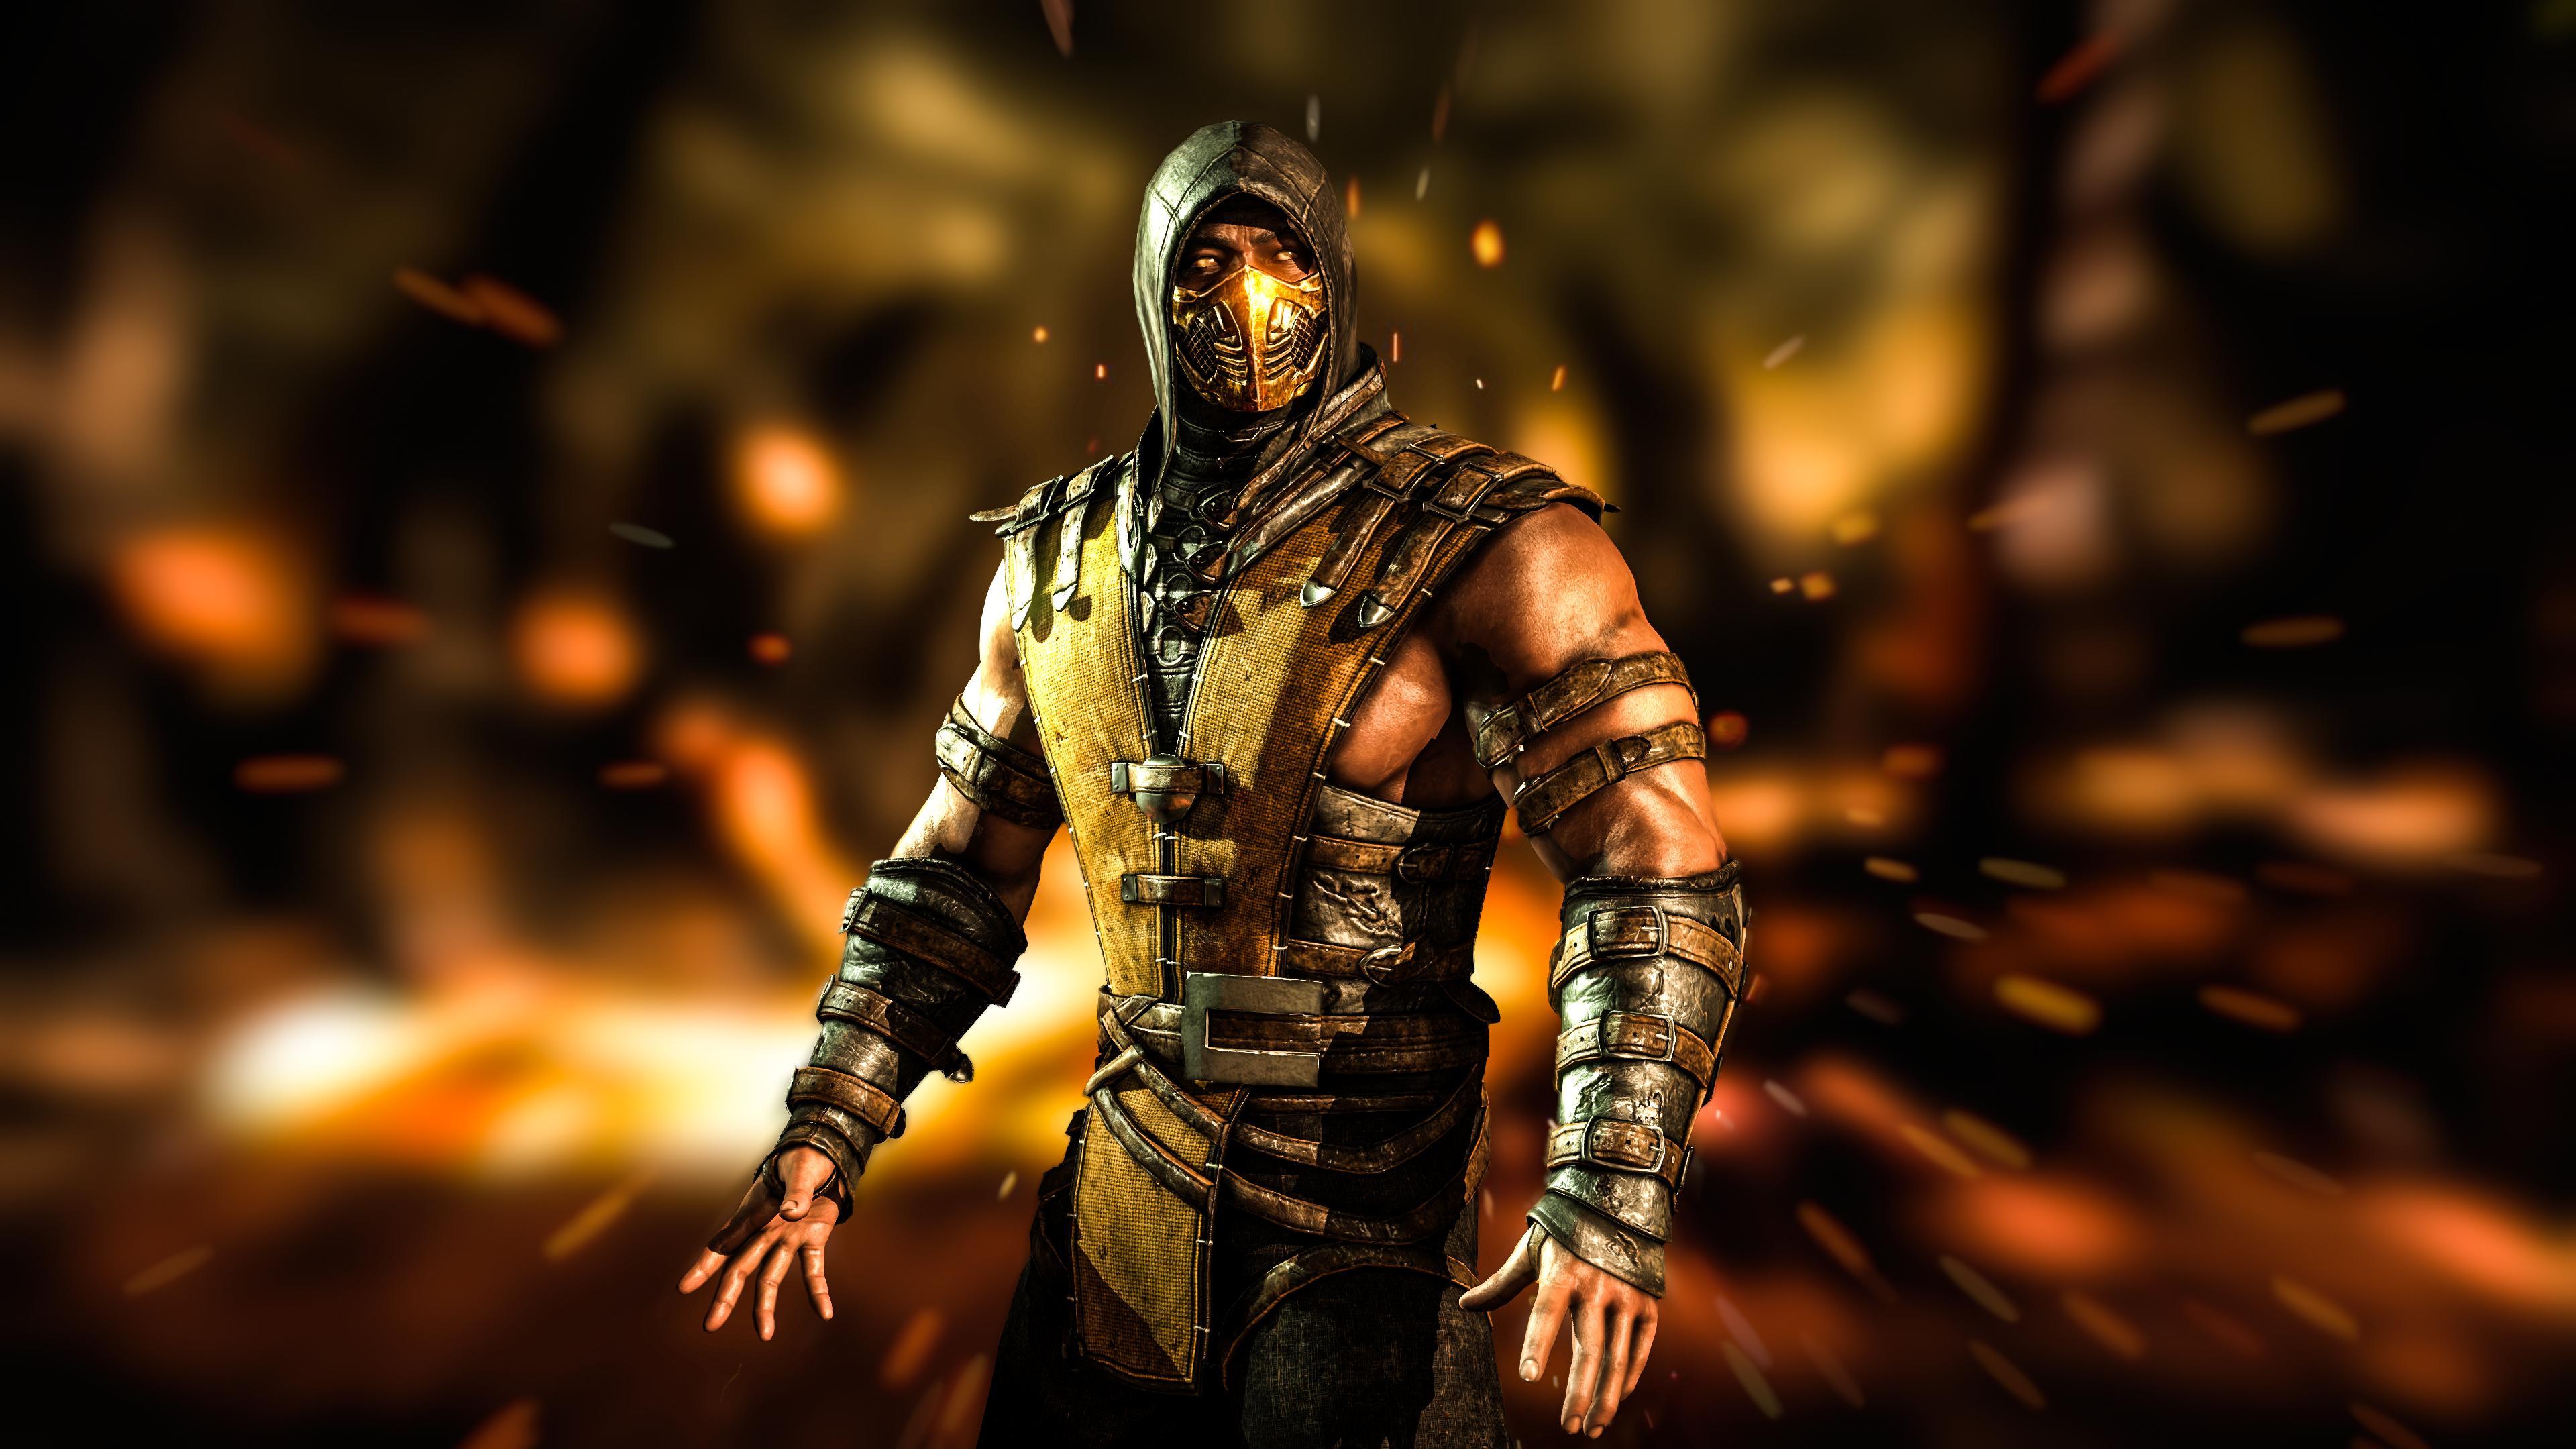 Mortal Kombat Scorpion Wallpaper 3840x2160